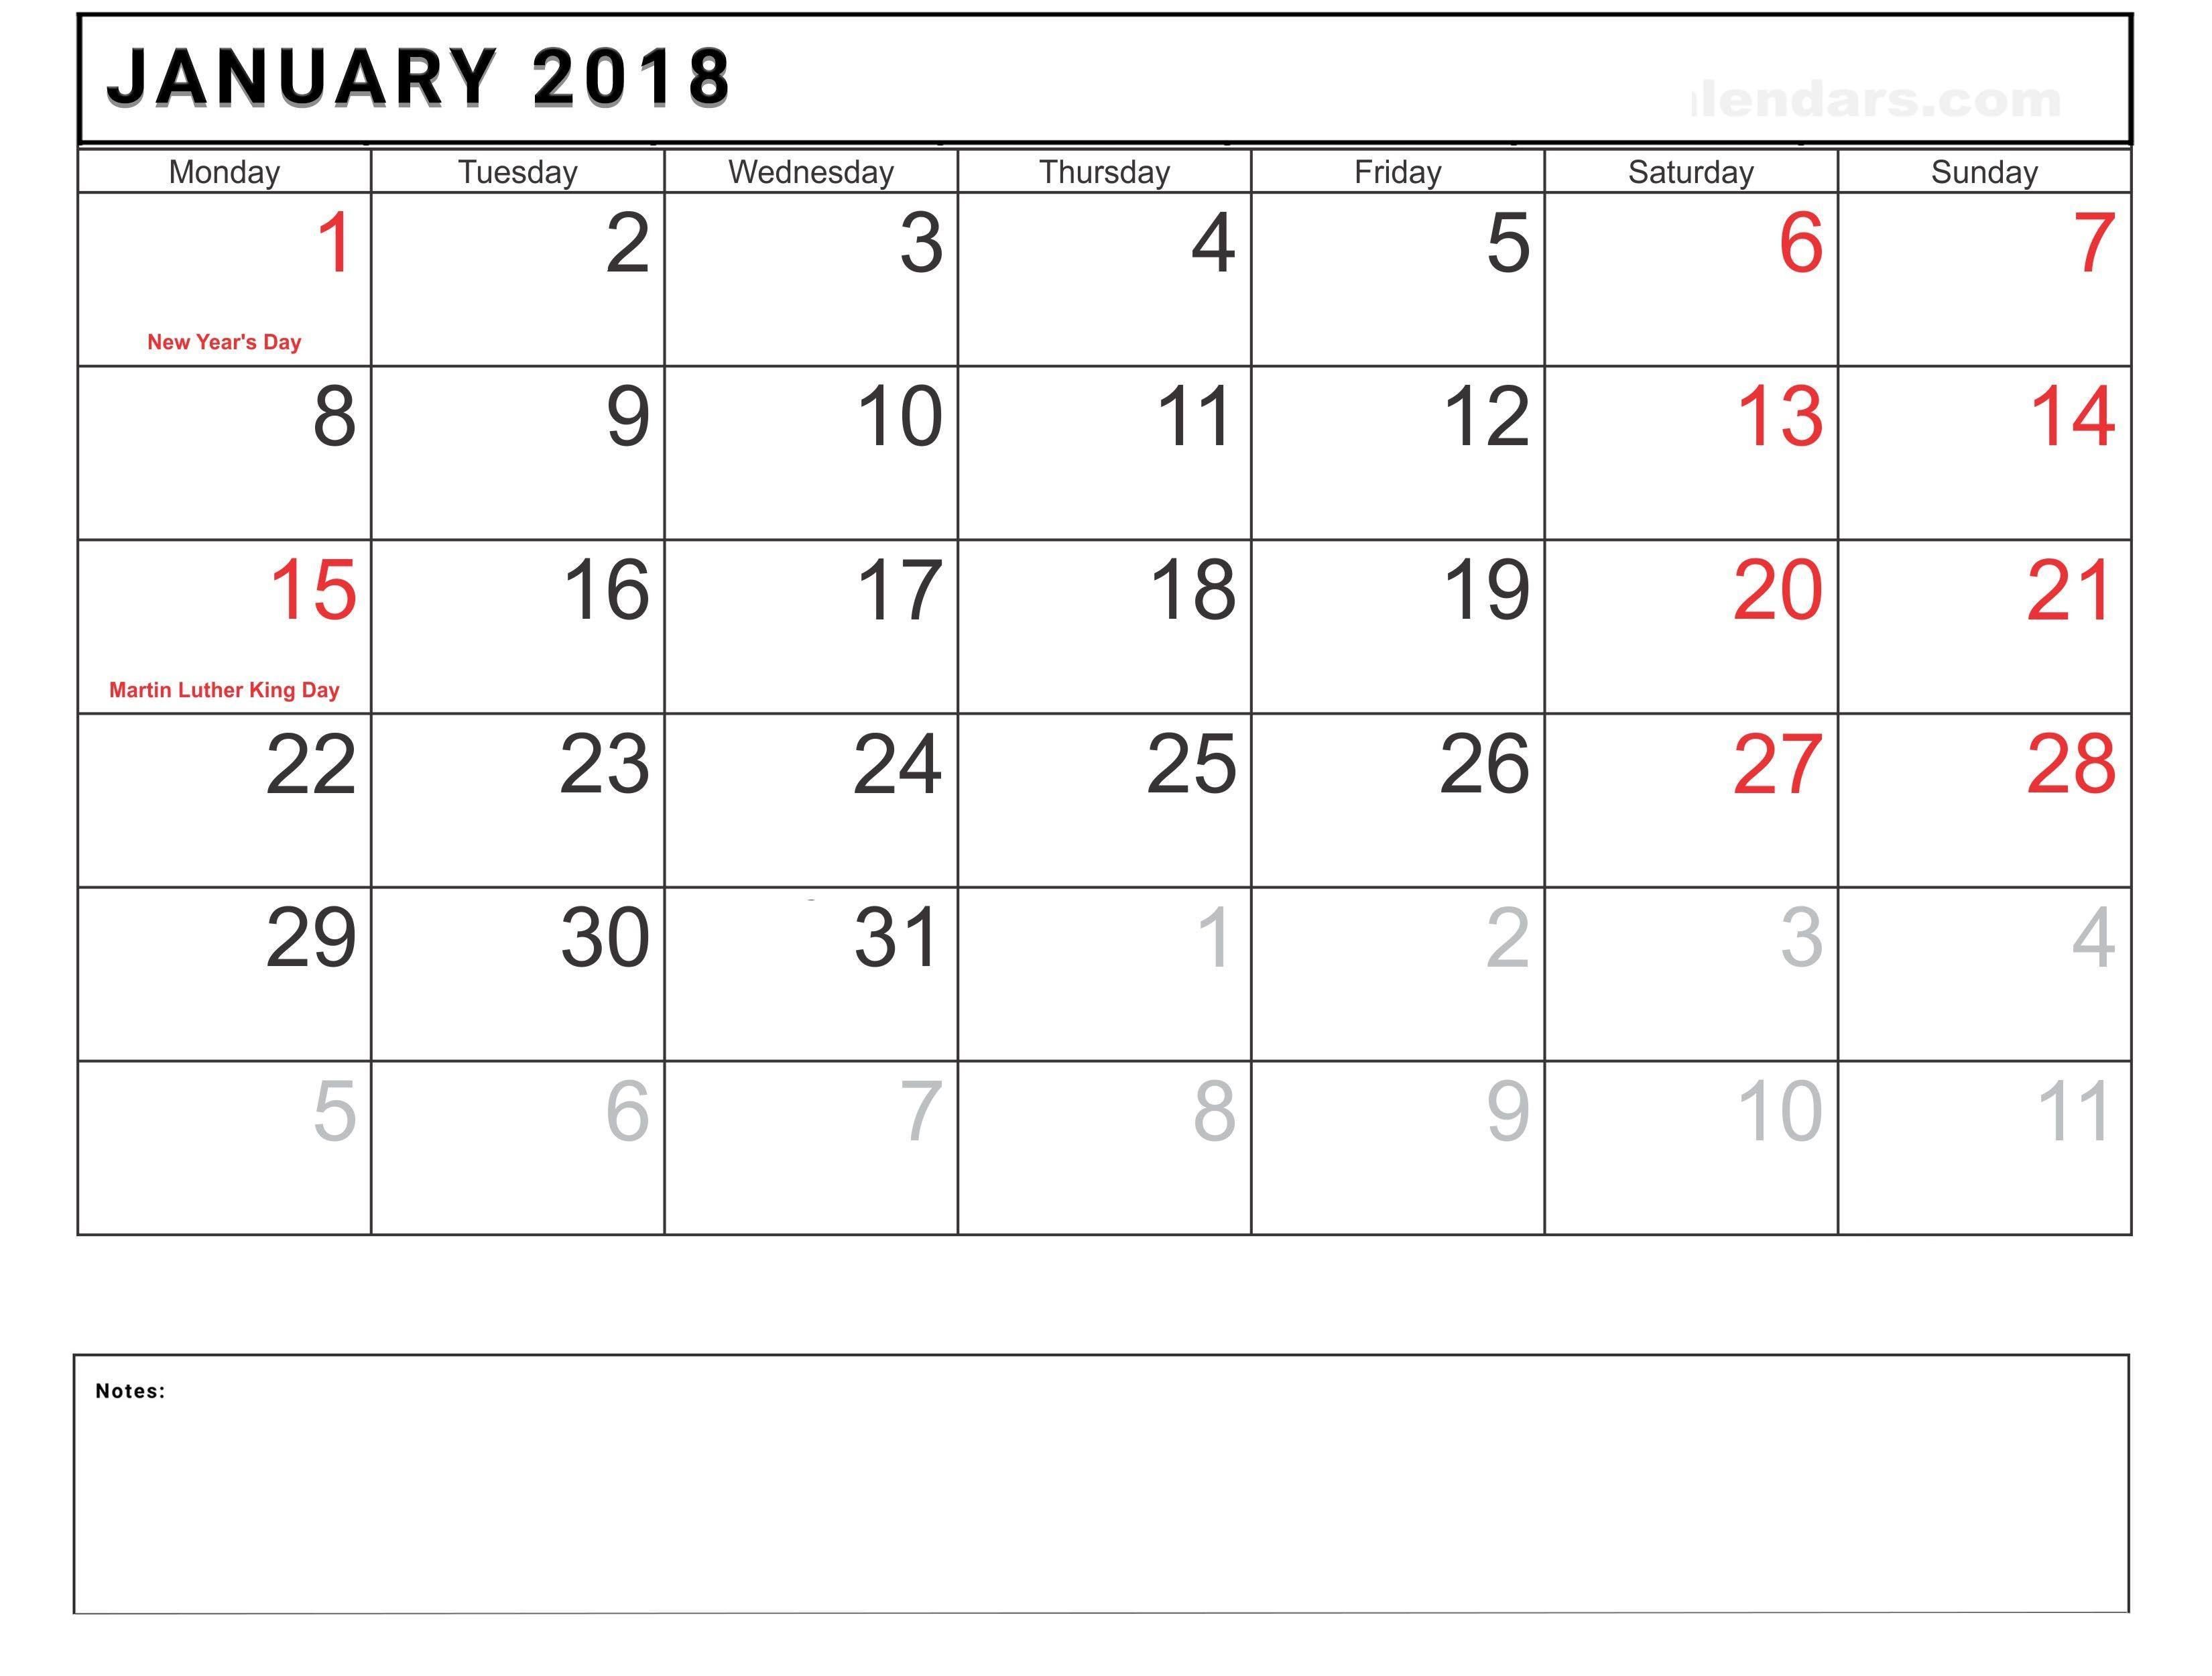 Calendar Wallpaper Jan : January calendar wallpapers wallpaper cave